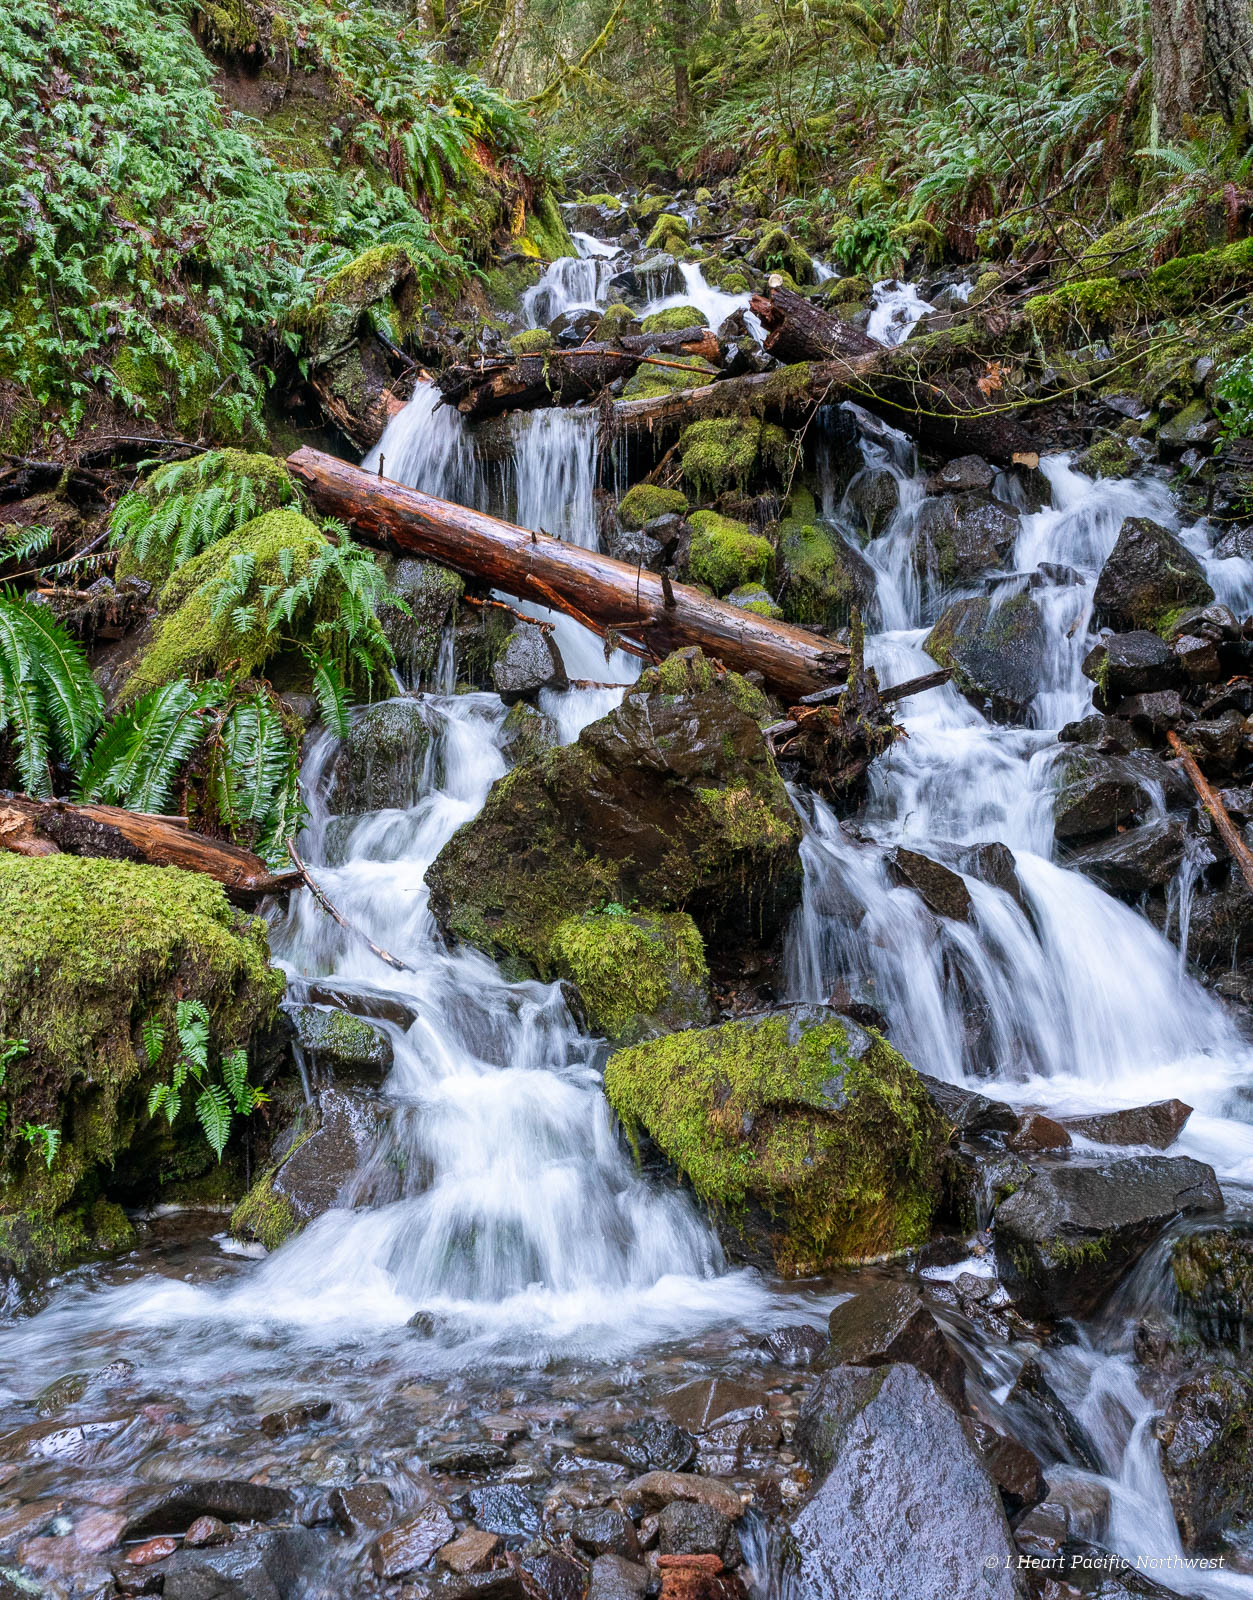 Salmon River Canyon hike